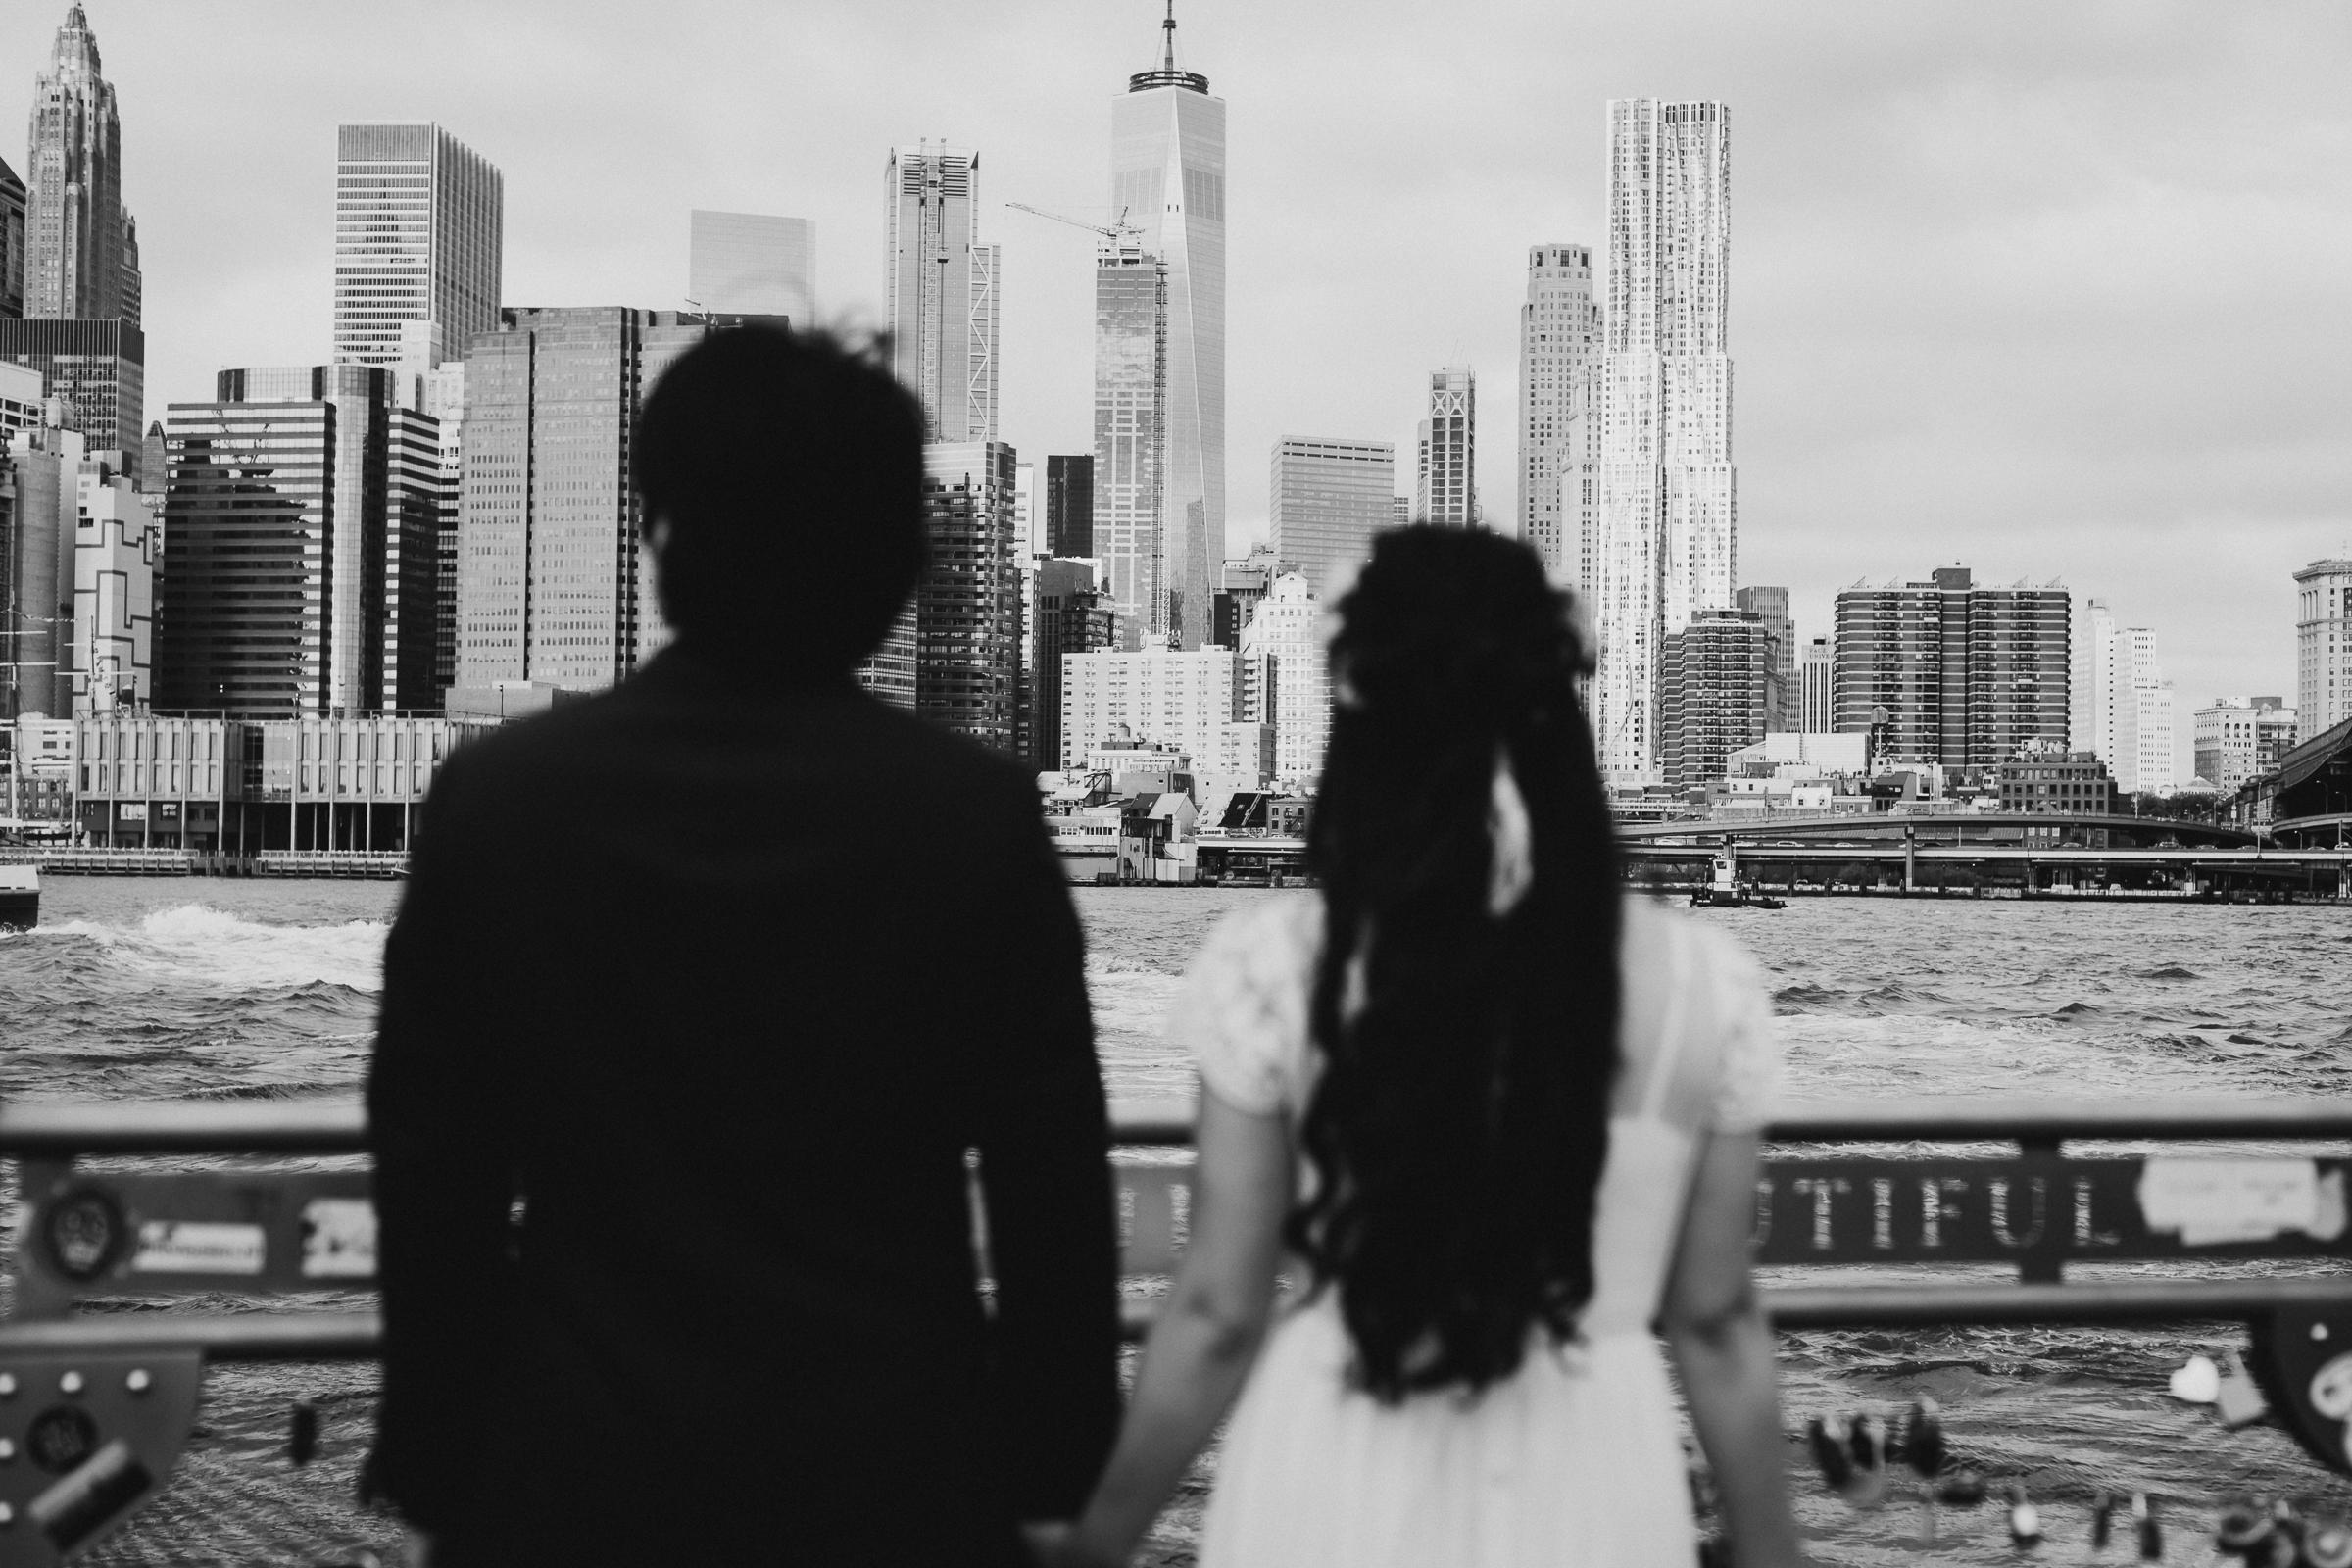 Central-Park-Brooklyn-Bridge-Dumbo-NYC-Documentary-Wedding-Photographer-21.jpg